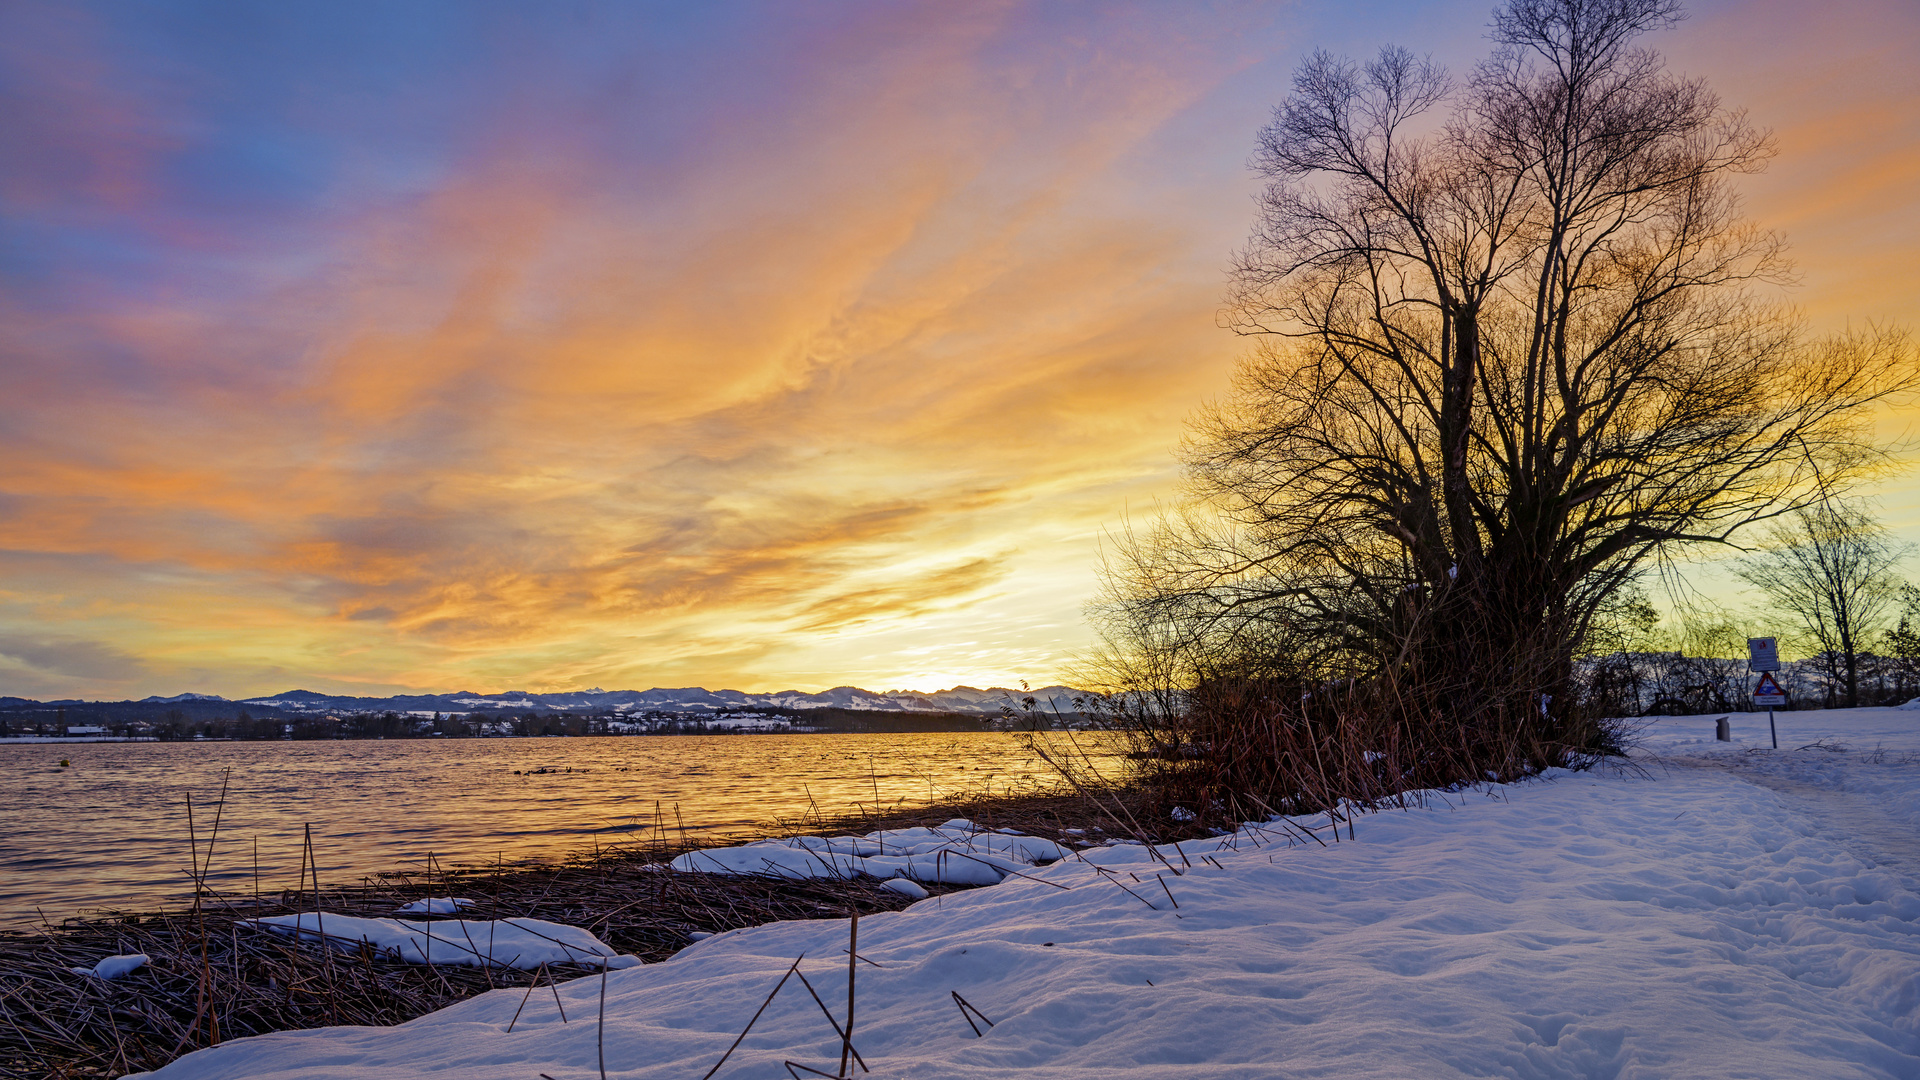 озеро, закат, дерево, снег, зима, пейзаж